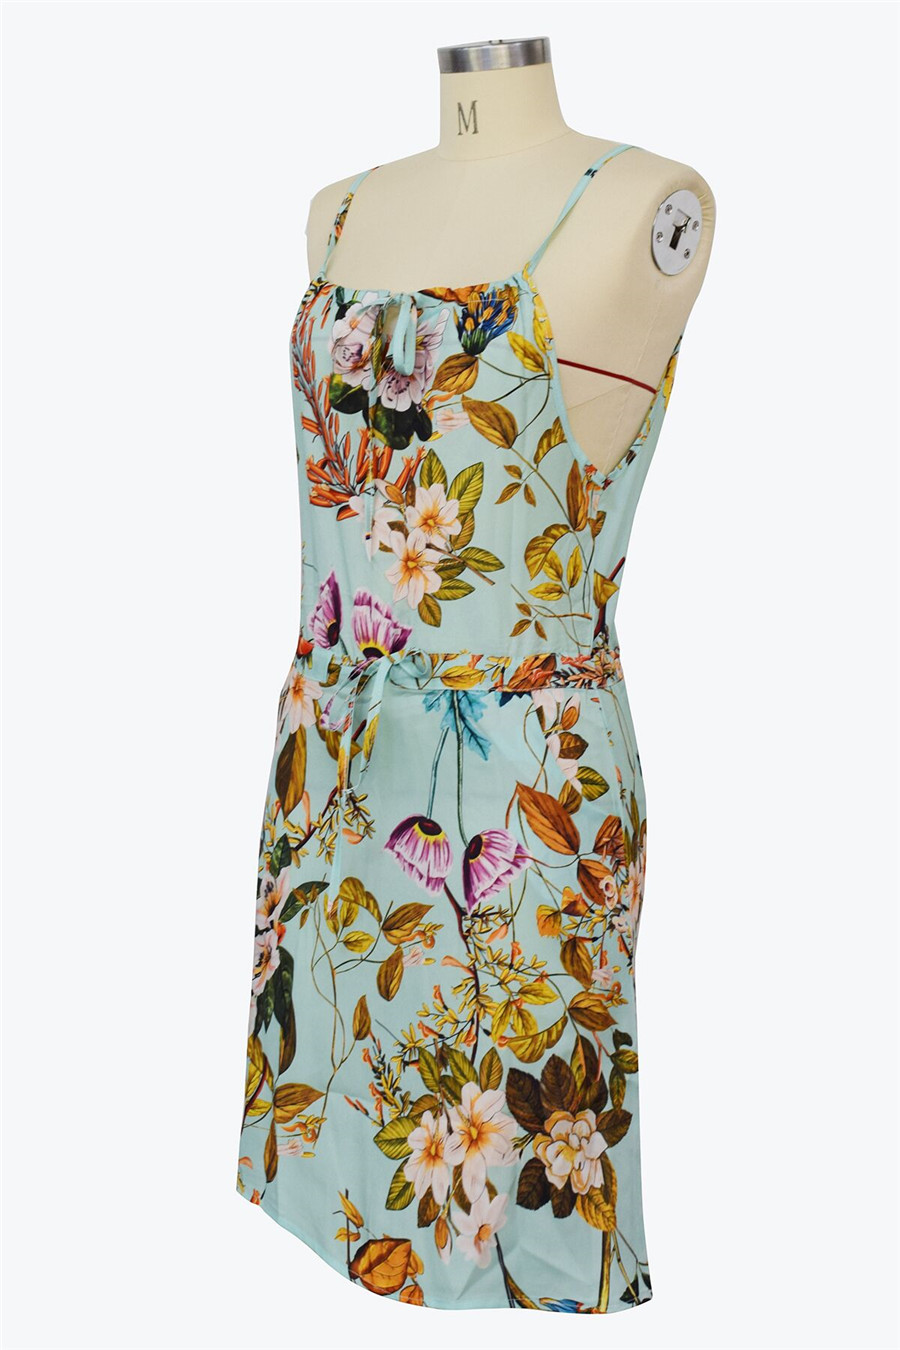 Gladiolus Chiffon Women Summer Dress Spaghetti Strap Floral Print Pocket Sexy Bohemian Beach Dress 2019 Short Ladies Dresses (31)